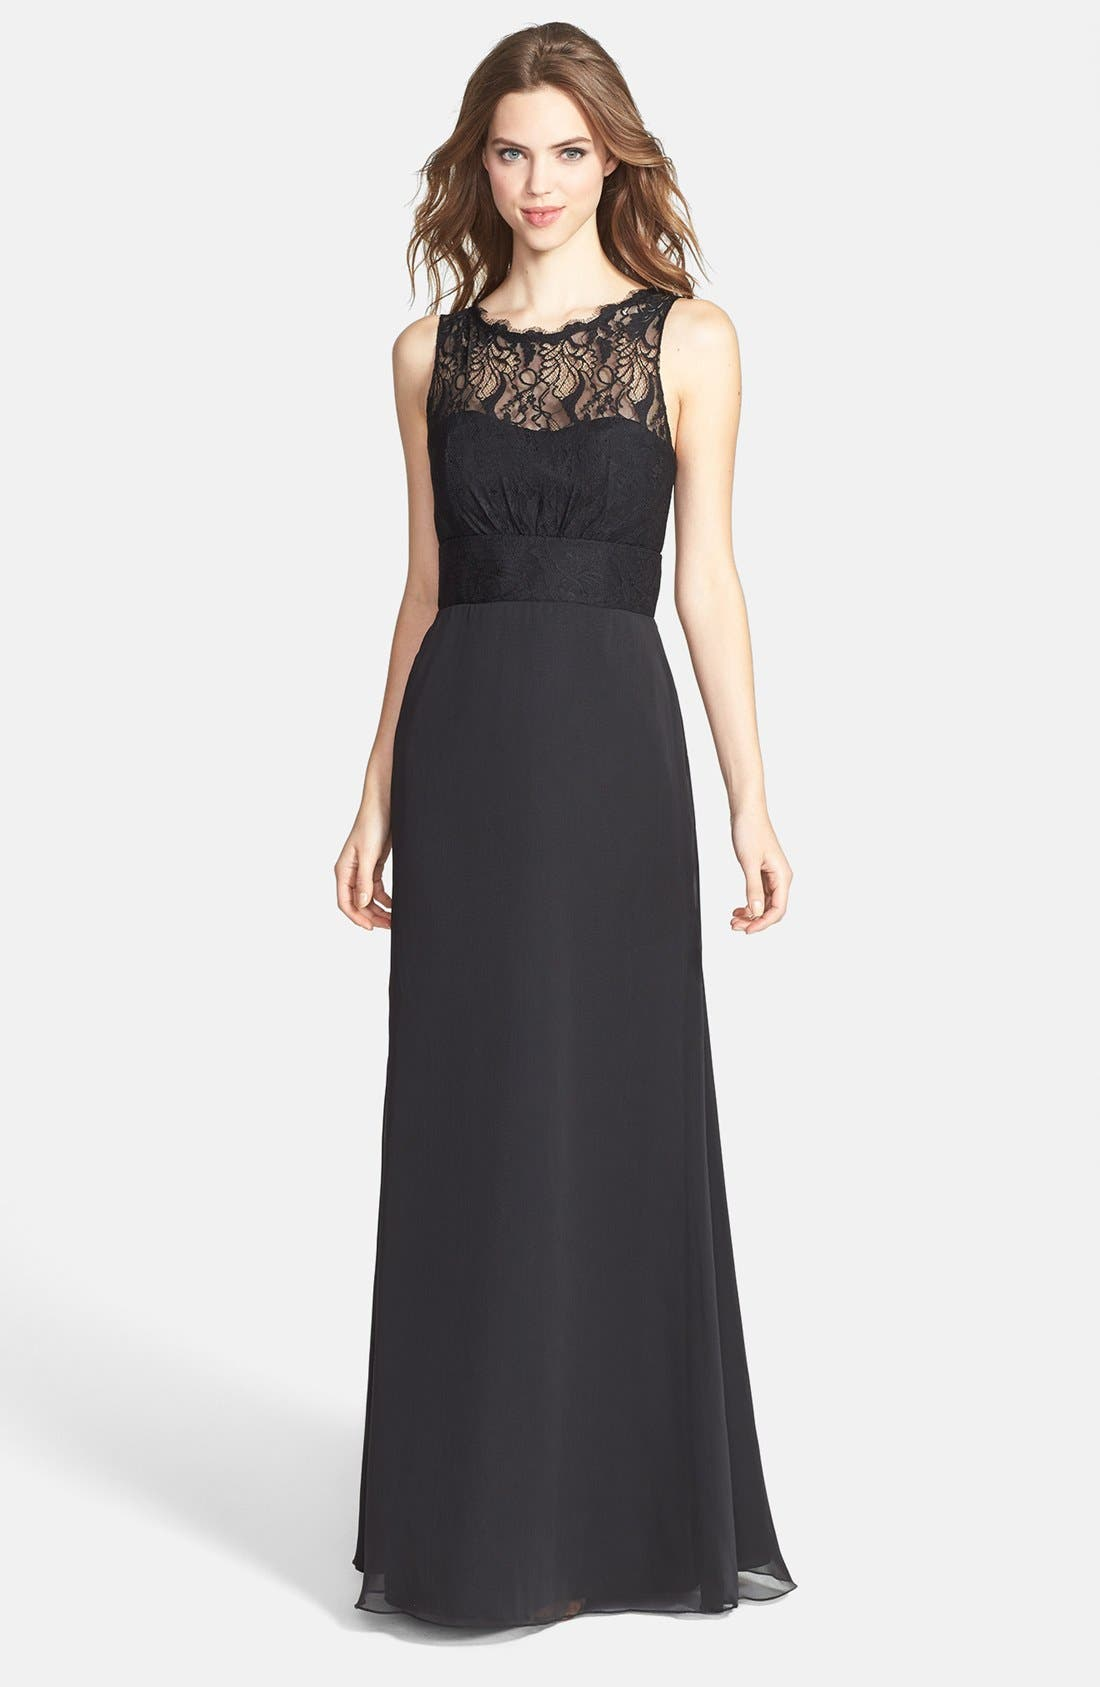 Alternate Image 1 Selected - Jim Hjelm Occasions Illusion Lace Bodice Chiffon Dress